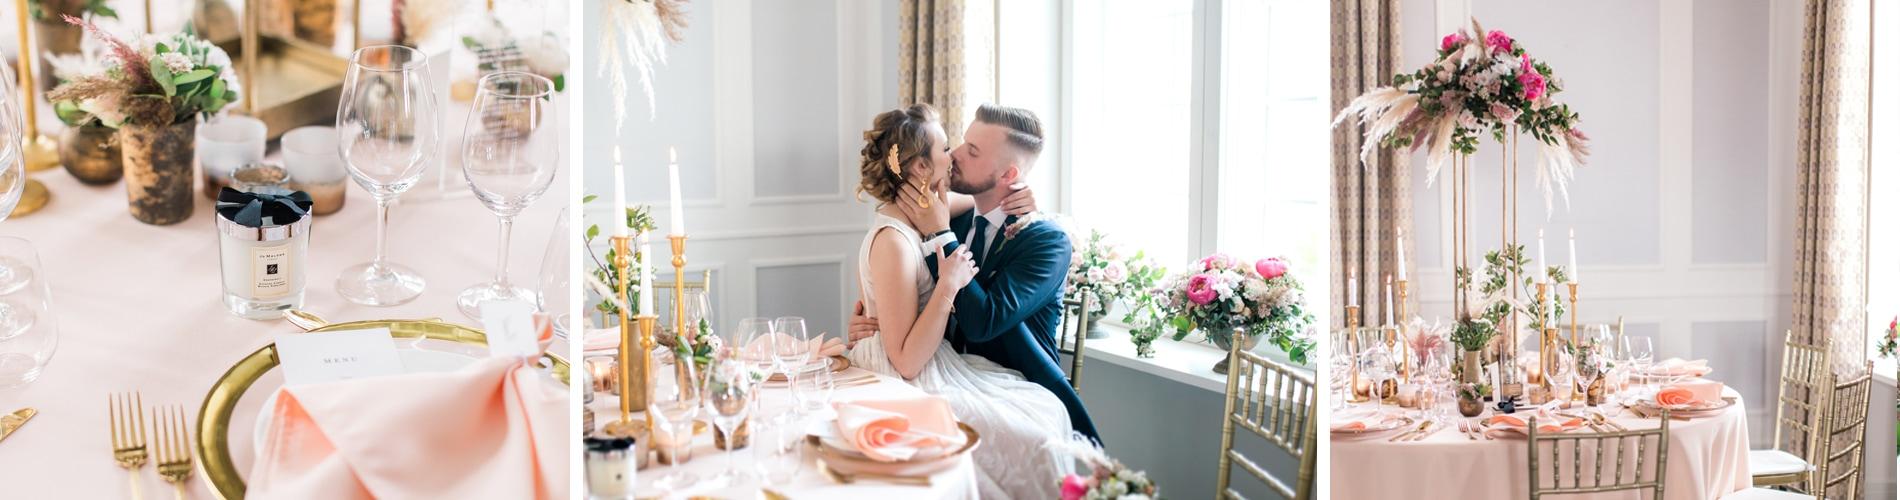 konsultant ślubny Gdańsk